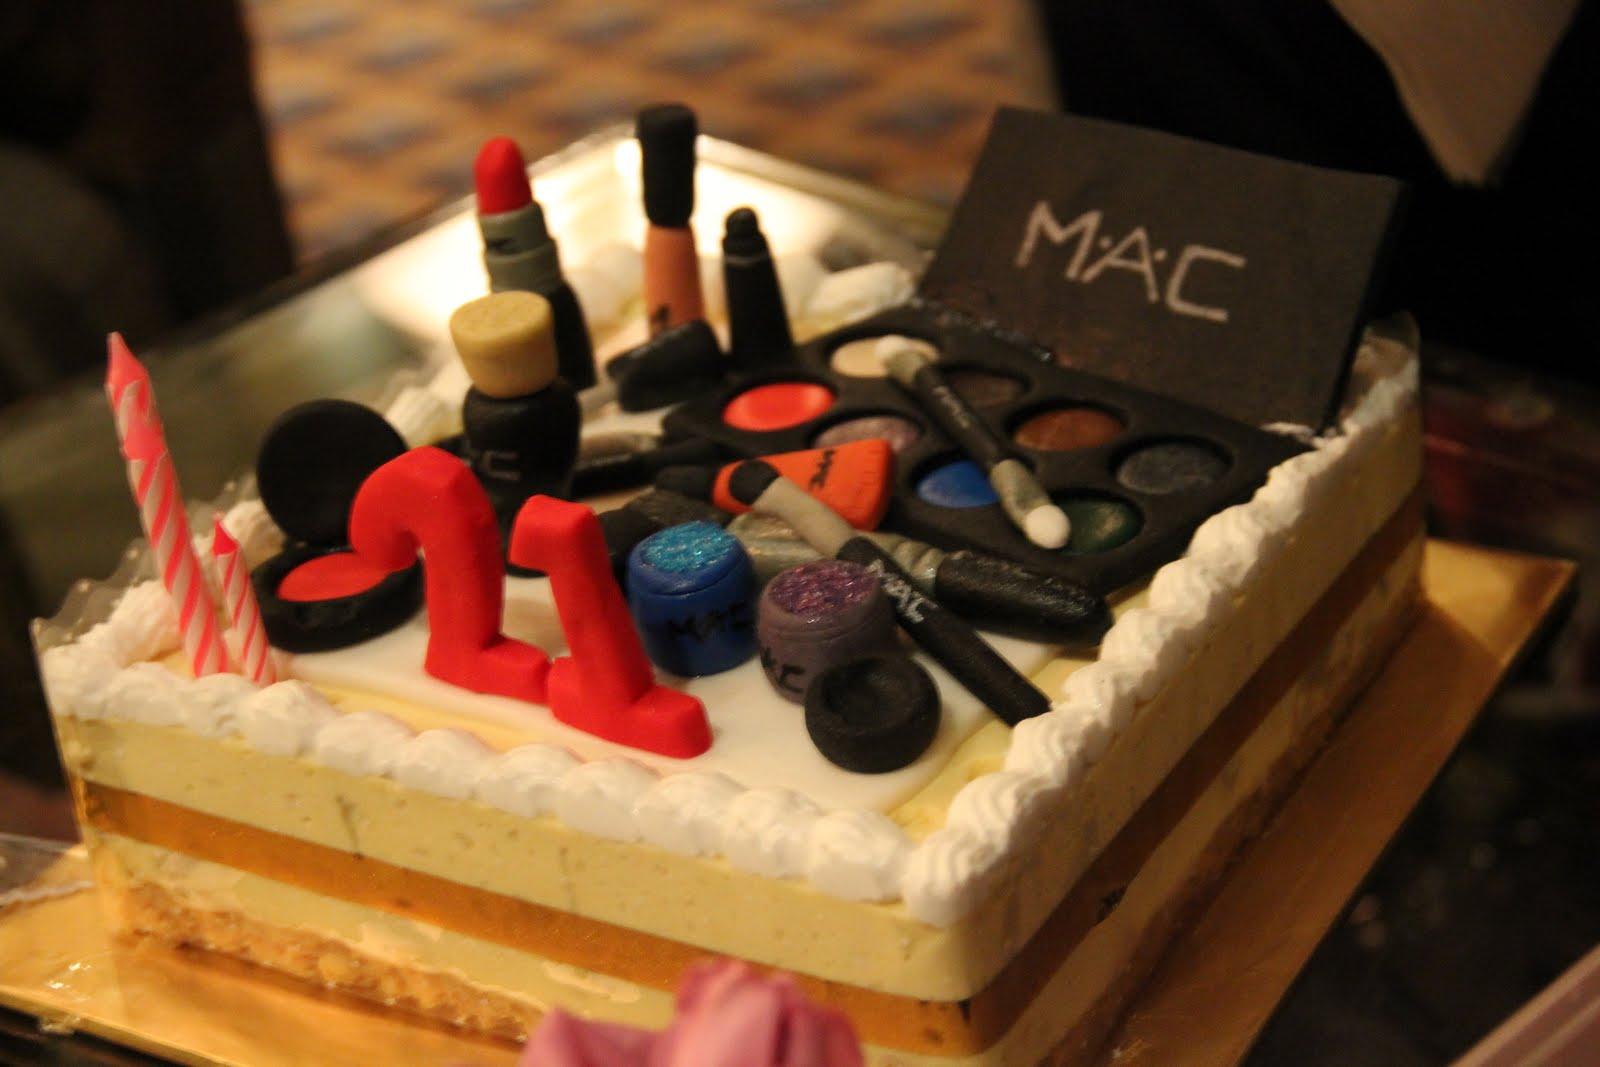 21st birthday cake :) - JennGorgeous